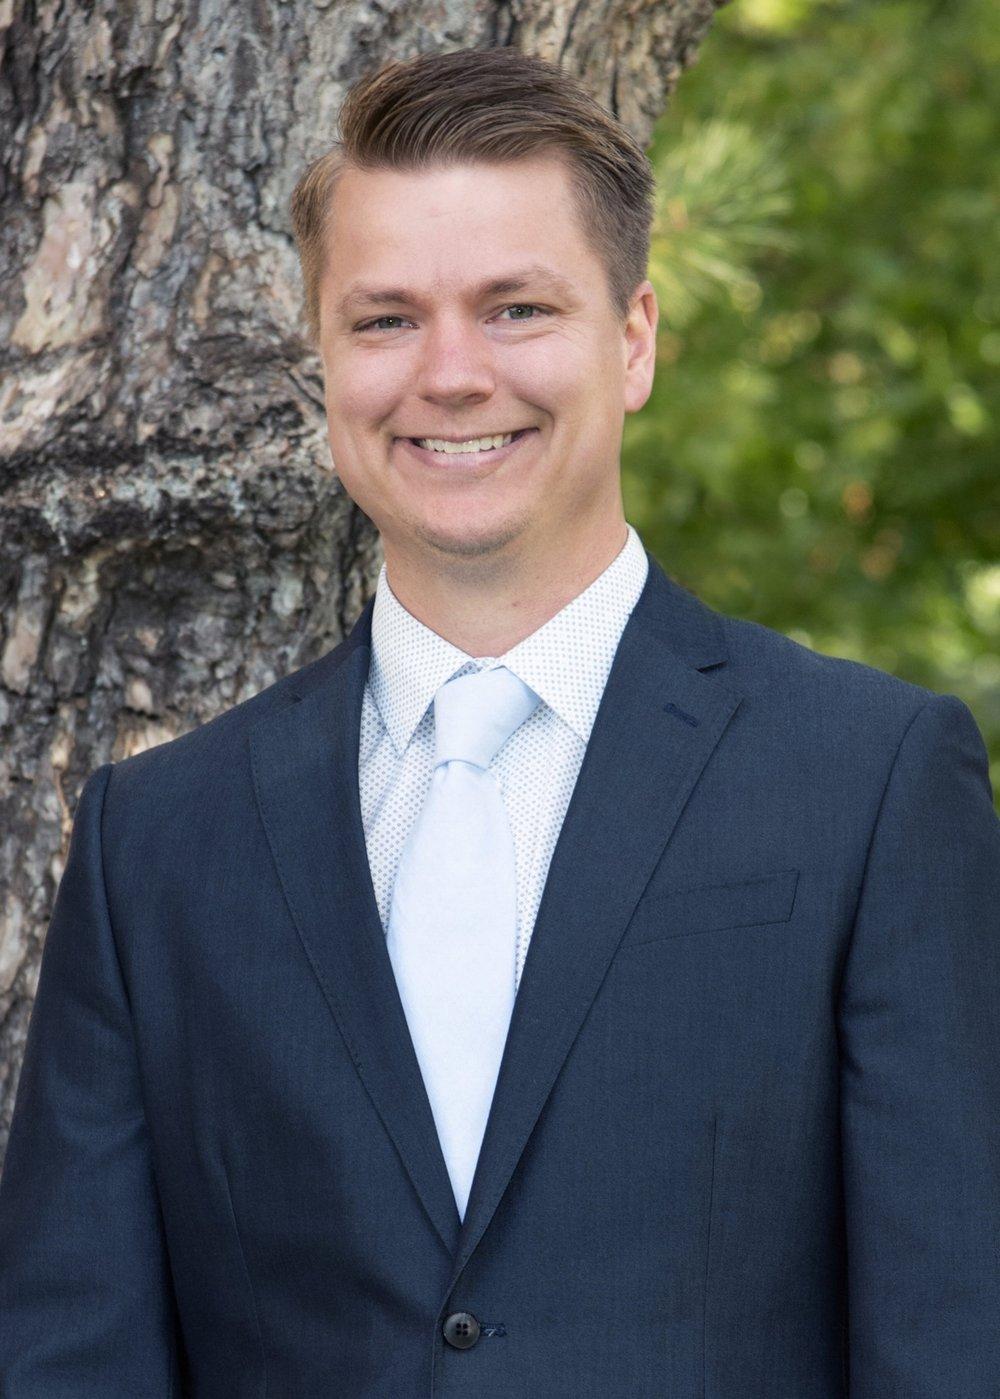 Dustin Anderson - Sr. Vice President